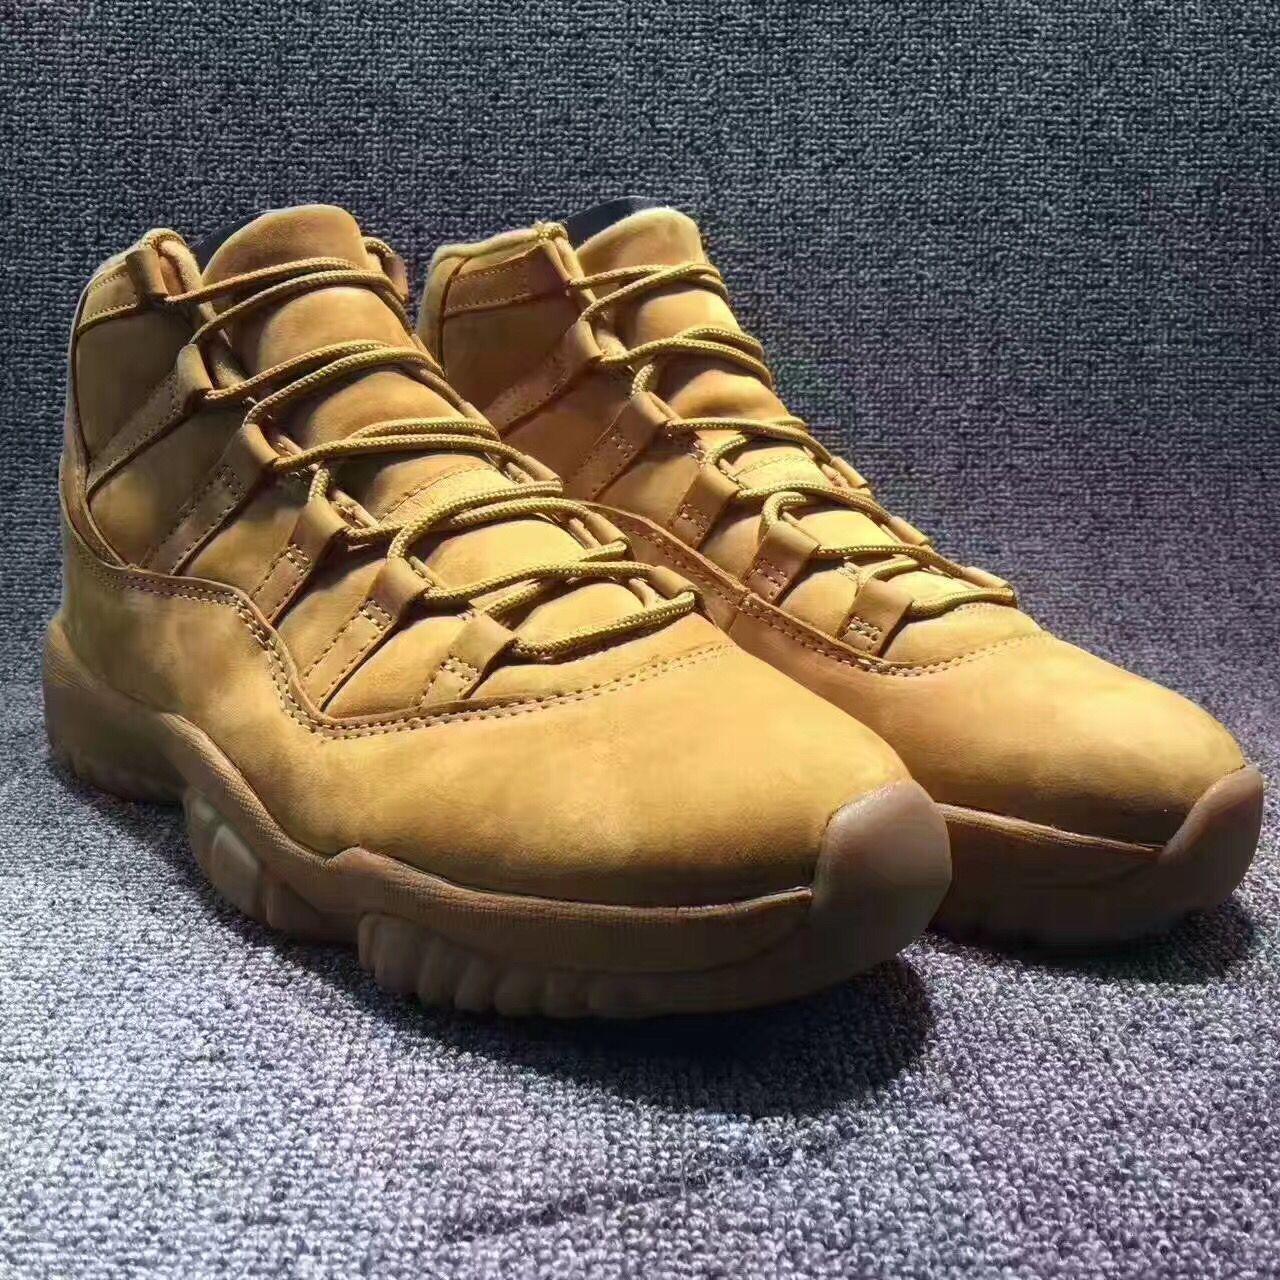 216a360a0ef JB Might Be Releasing These Air Jordan 11 PSNY Wheat – Housakicks